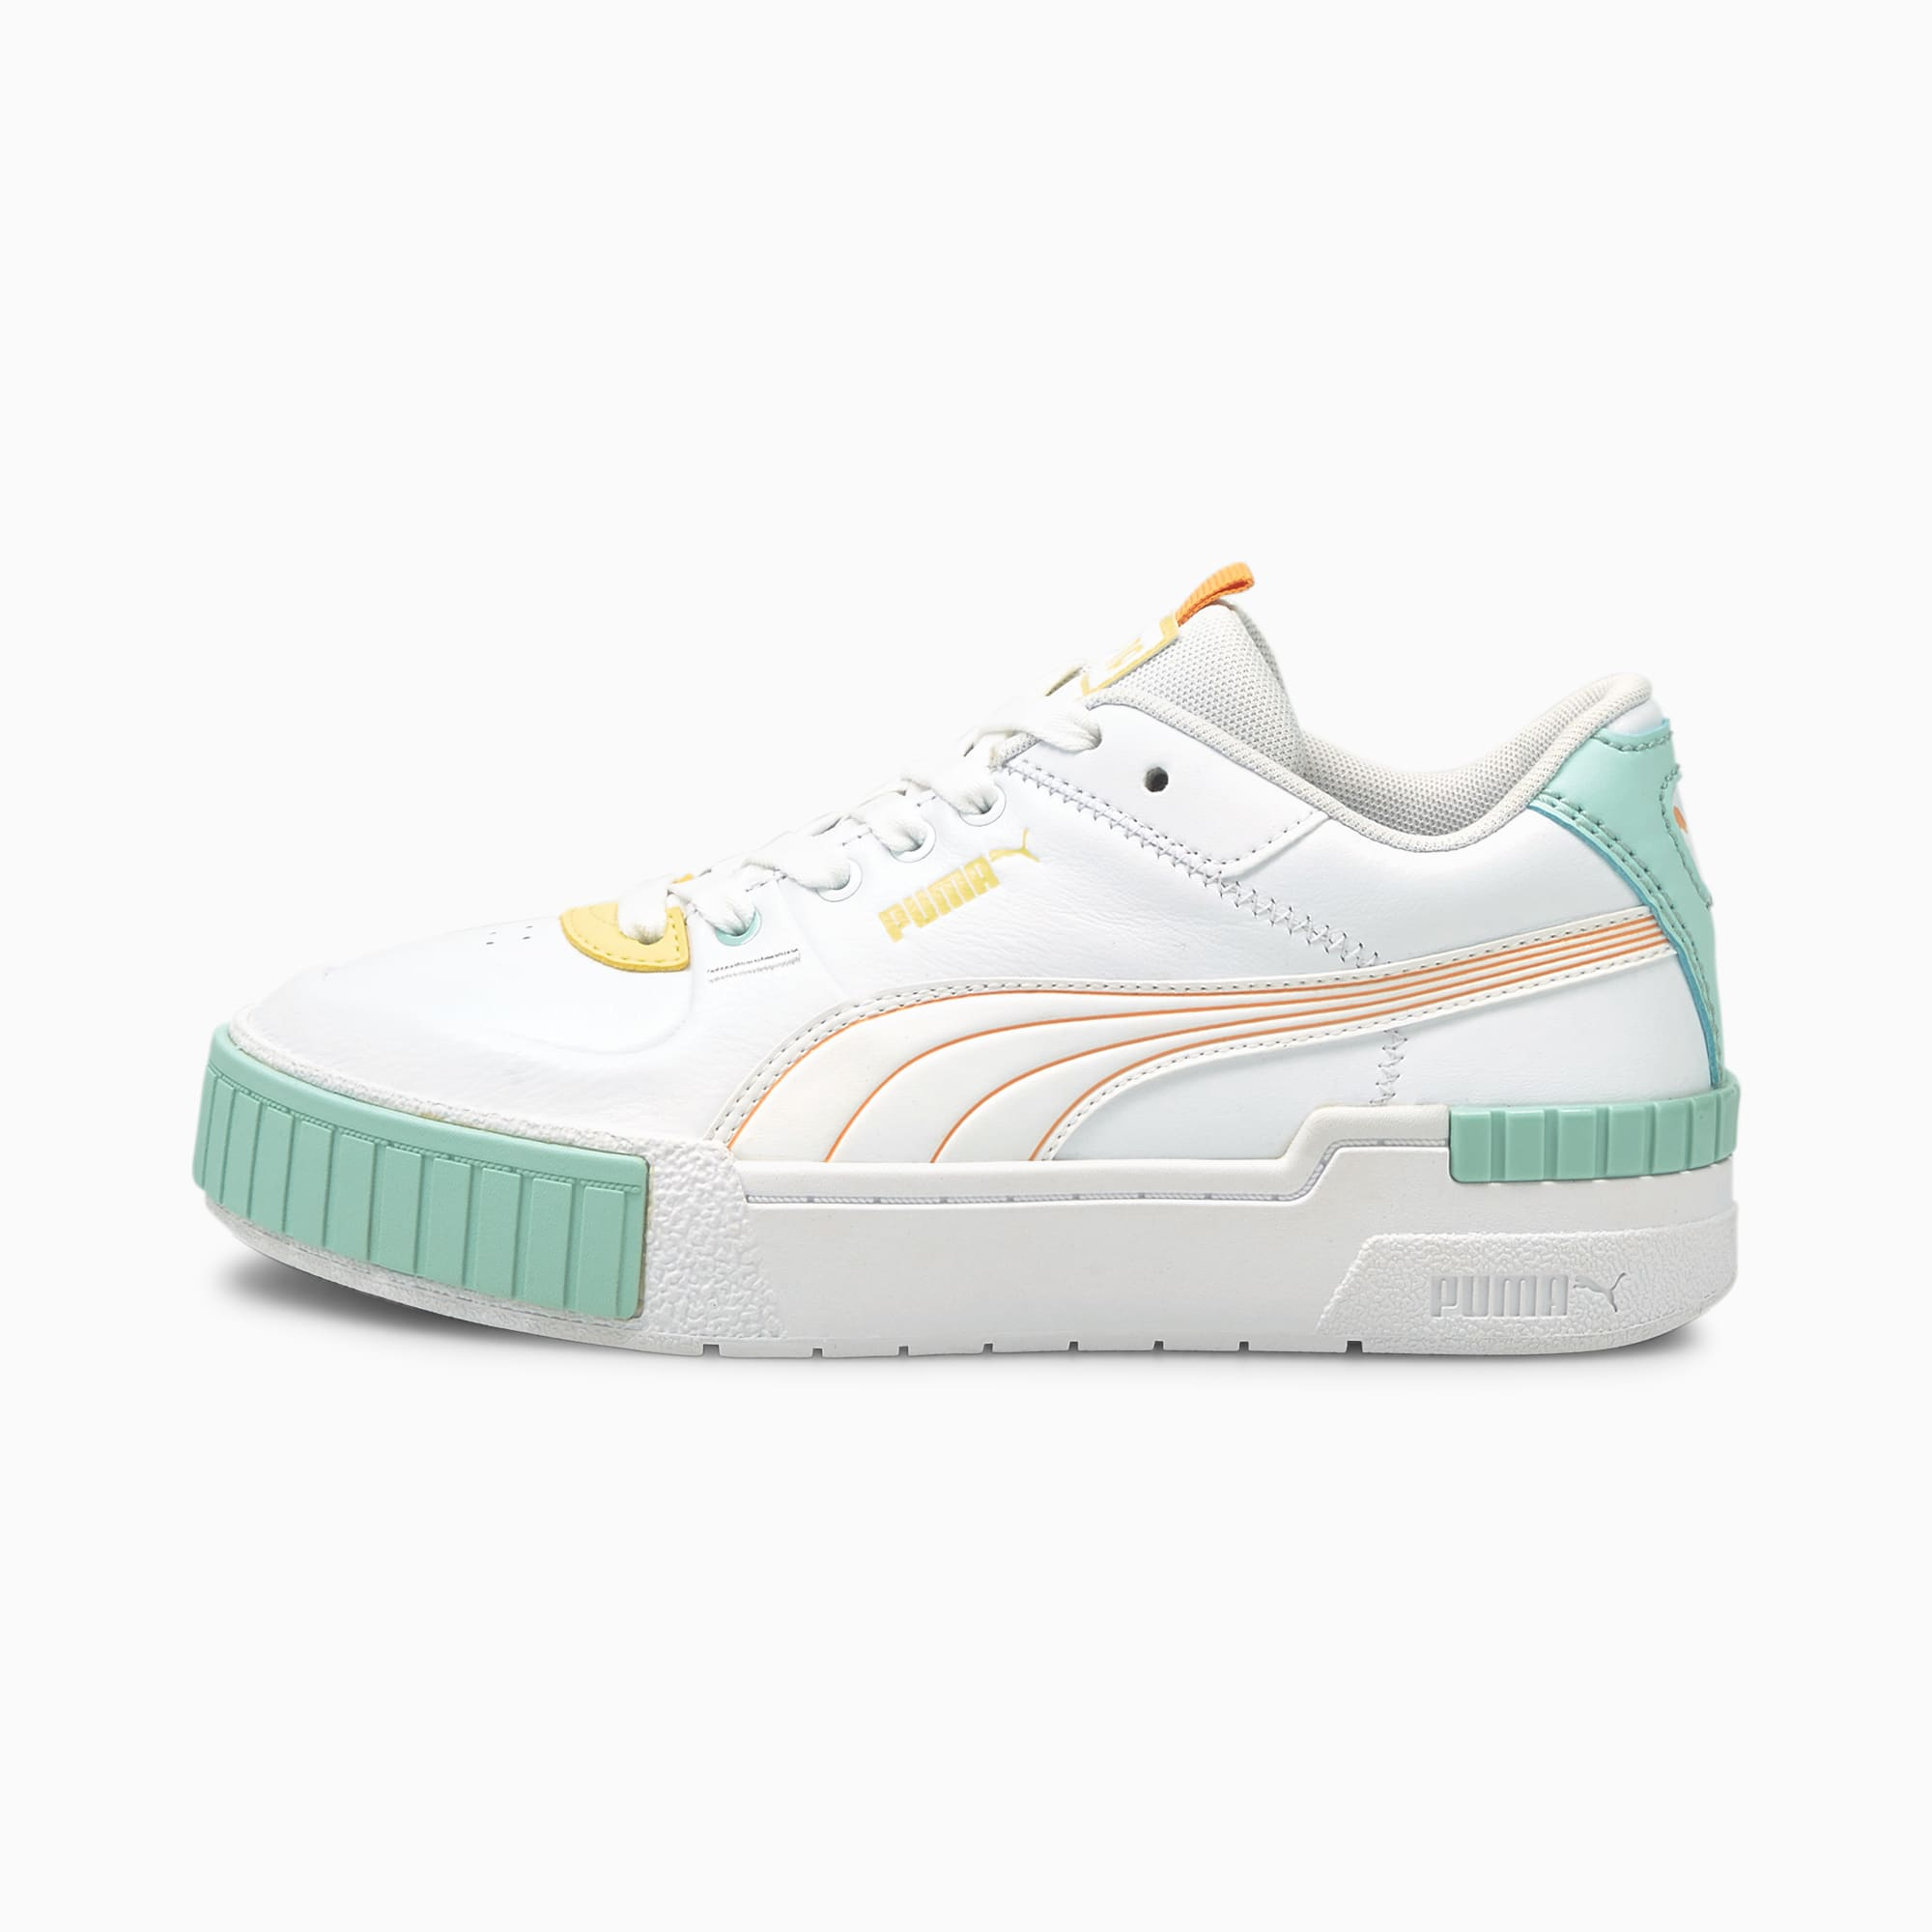 Cali Sport Pastel Mix sneakers dames, Wit/Roze, Maat 38,5   PUMA